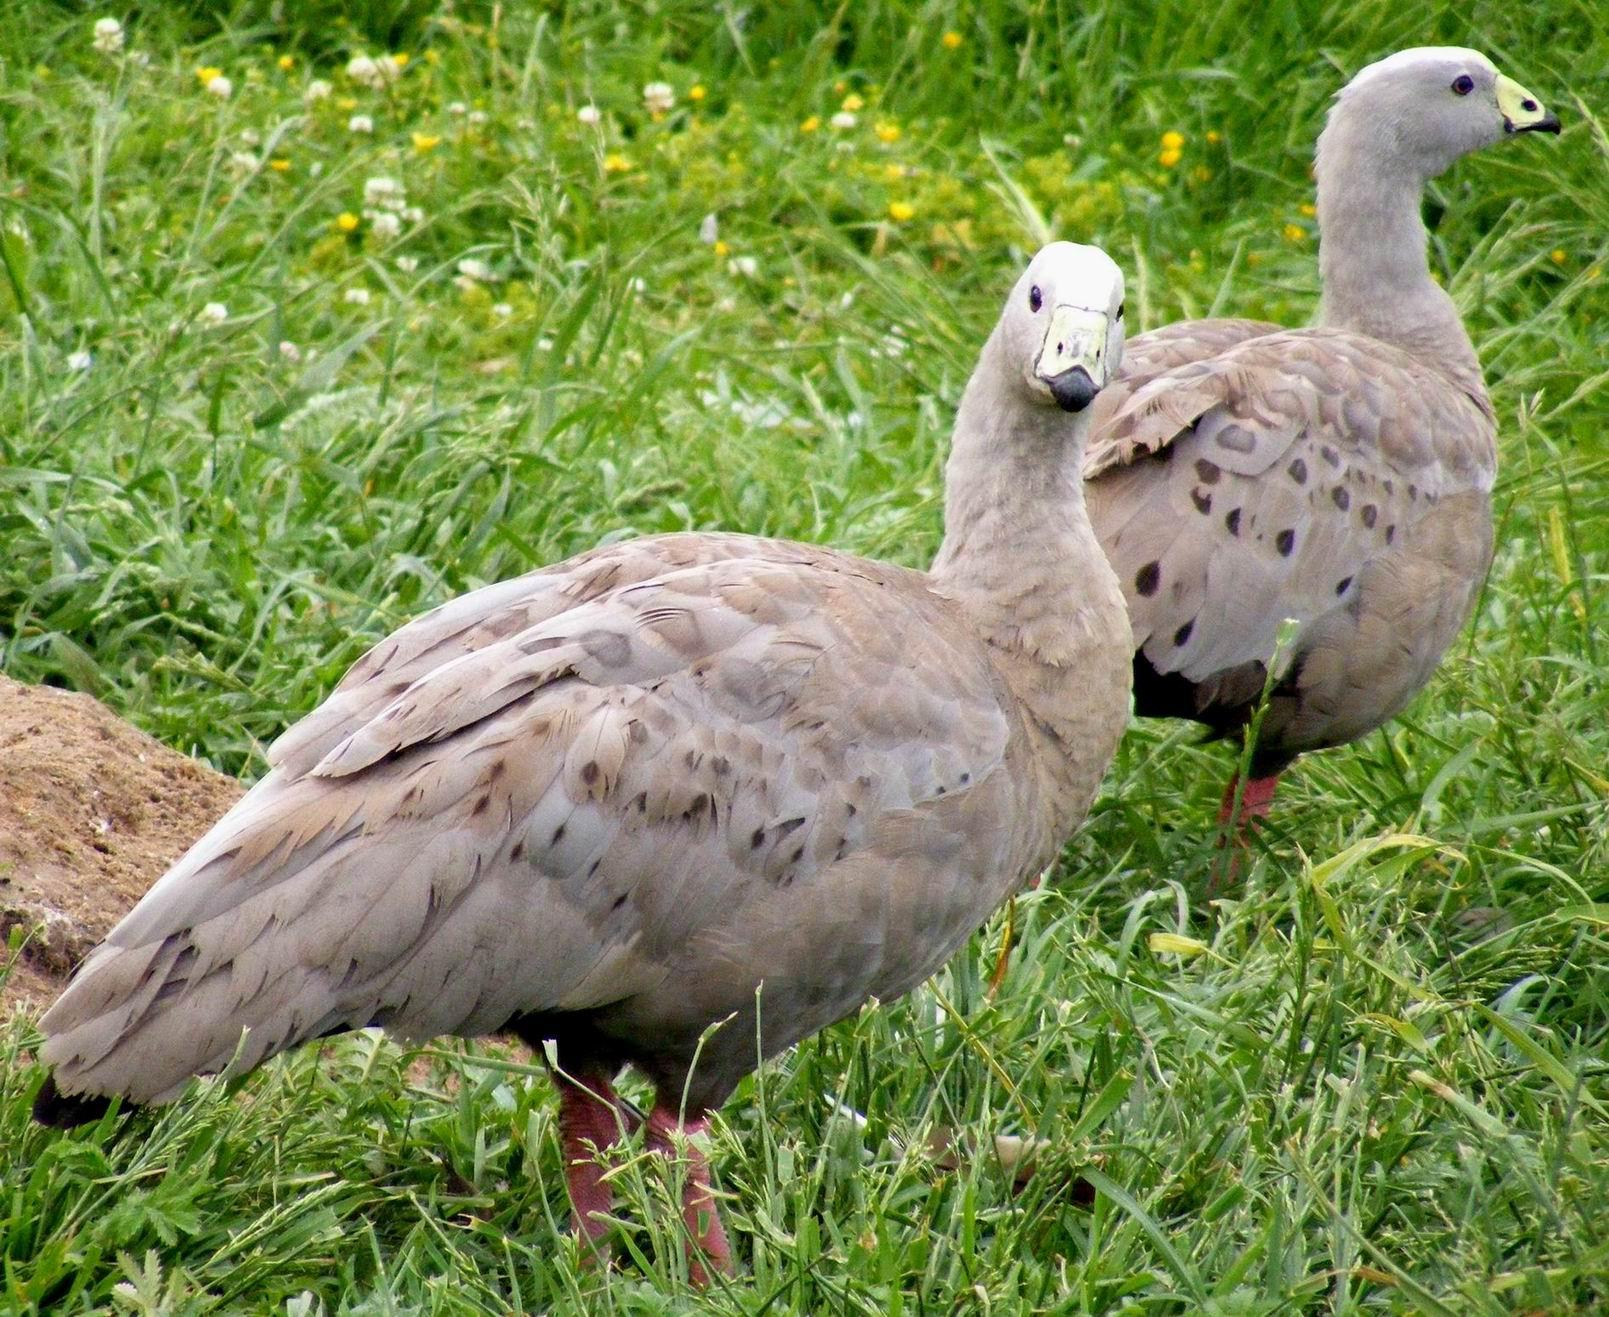 Куриные гуси. Парк птиц 'Воробьи'